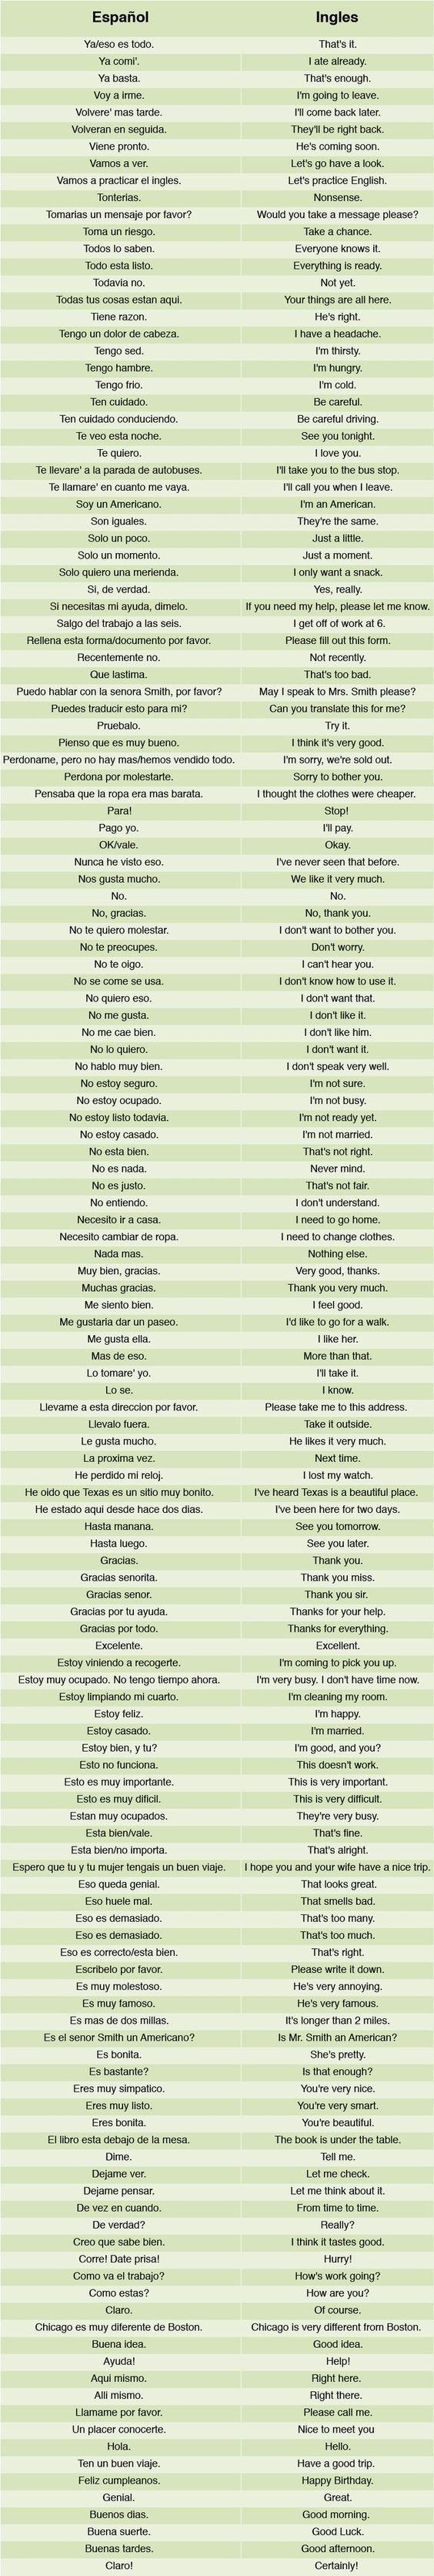 Frases para conversar